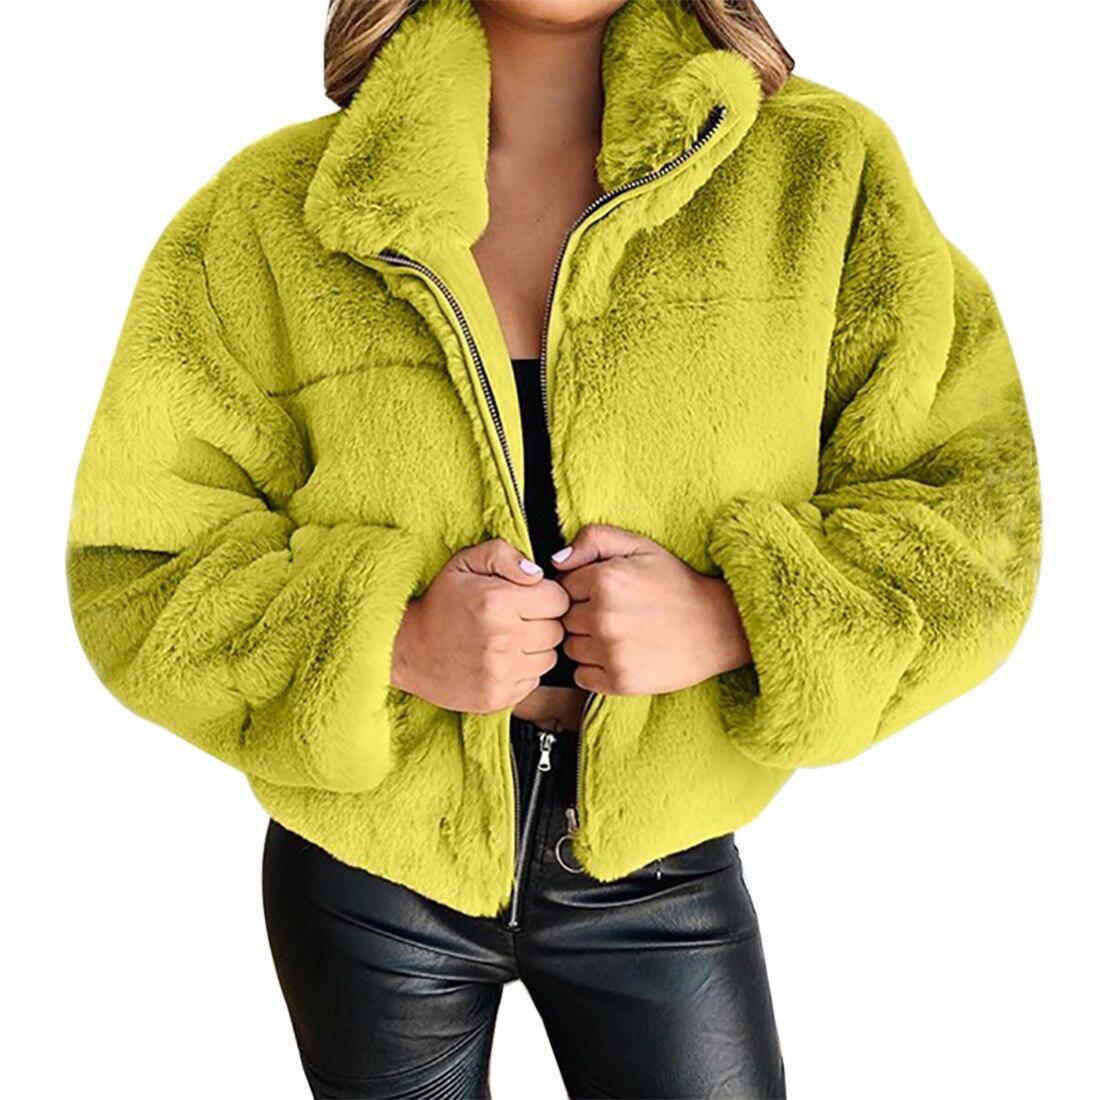 Autumn Winter Women Faux Fur Coat Warm Soft Zipper Jacket Ladies Furry Teddy Coat Overcoat Casual Soft Plush Warm Outerwear Women Women's Clothings Women's Sweaters/Coat cb5feb1b7314637725a2e7: Blue|gray|Khaki|Pink|YELLOW